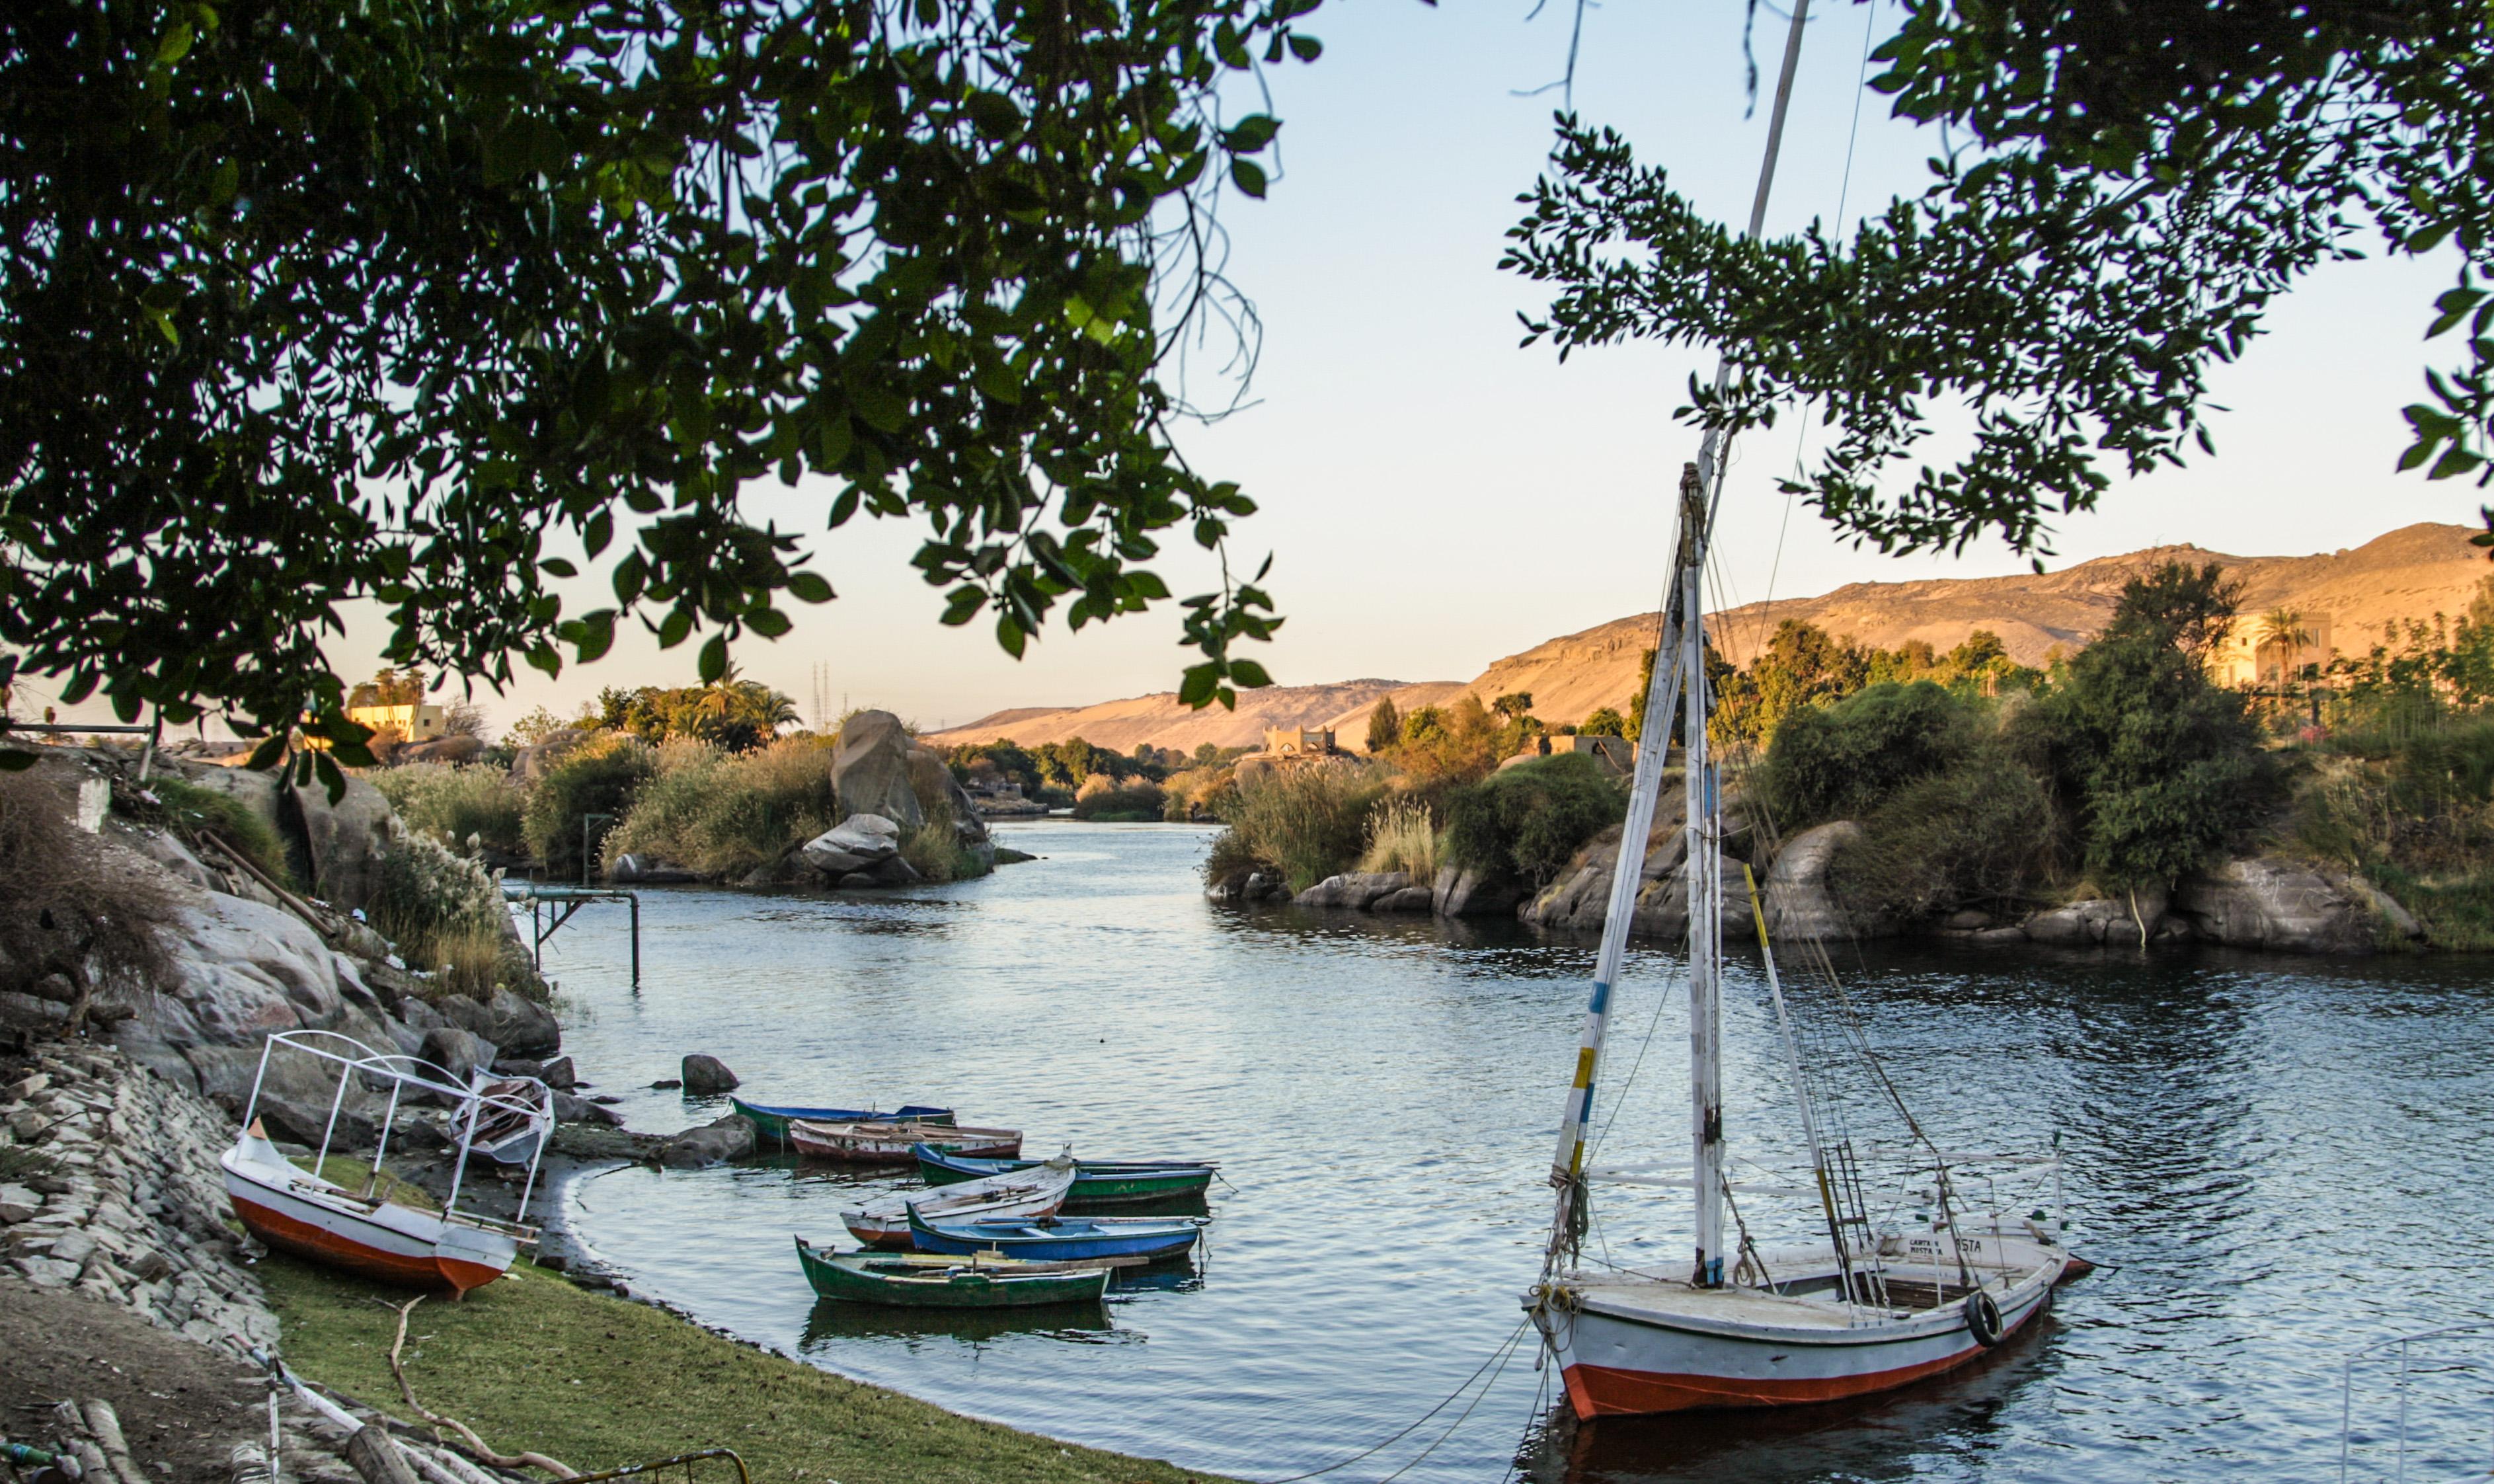 Elephantine Island in Aswan. Credit: Enas El Masry